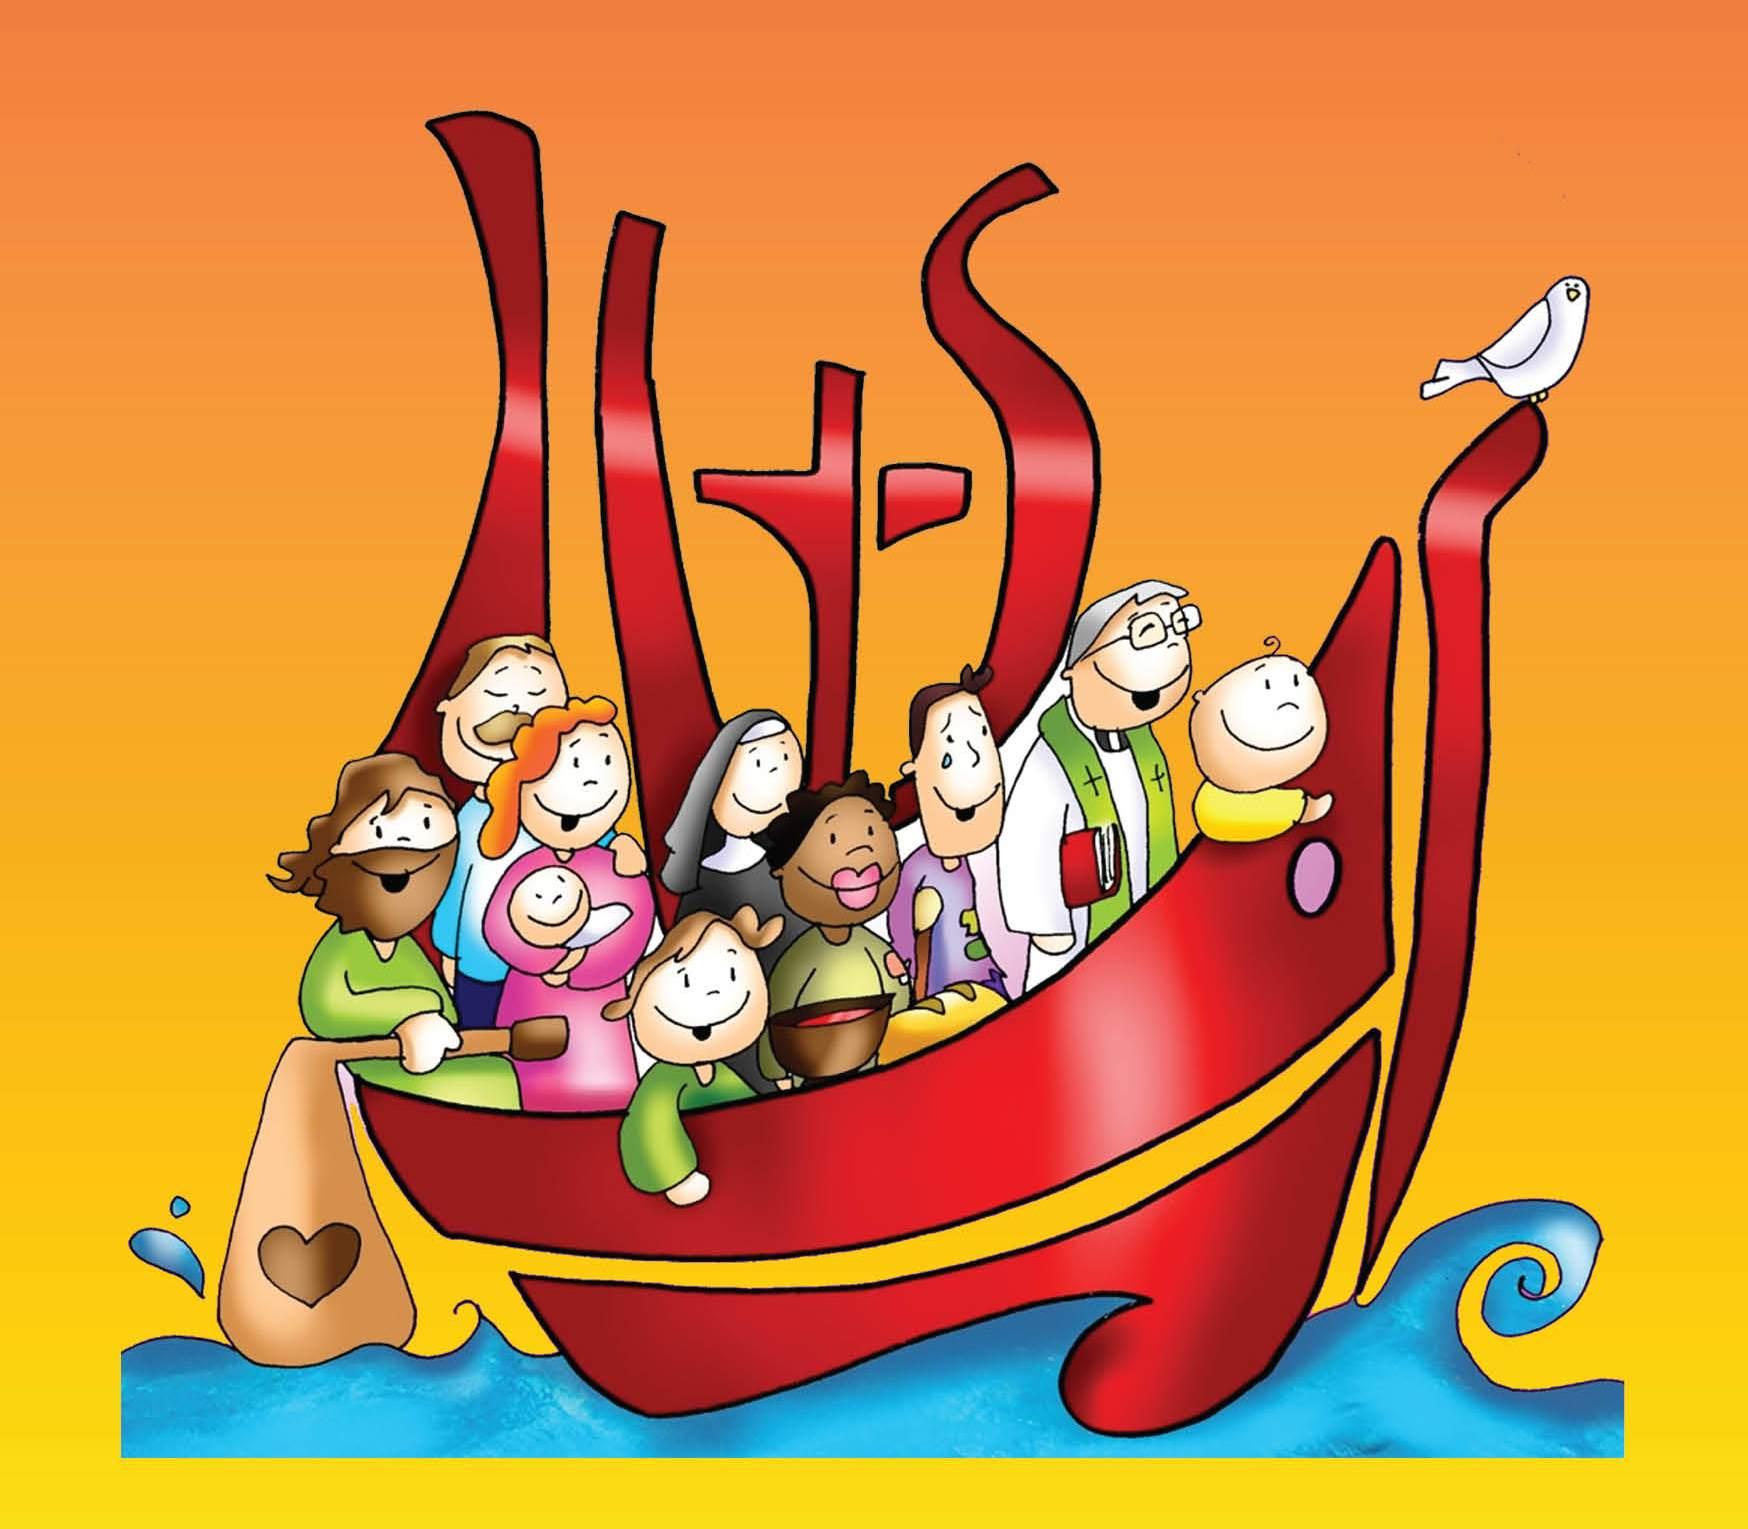 barca-catechismo.jpg